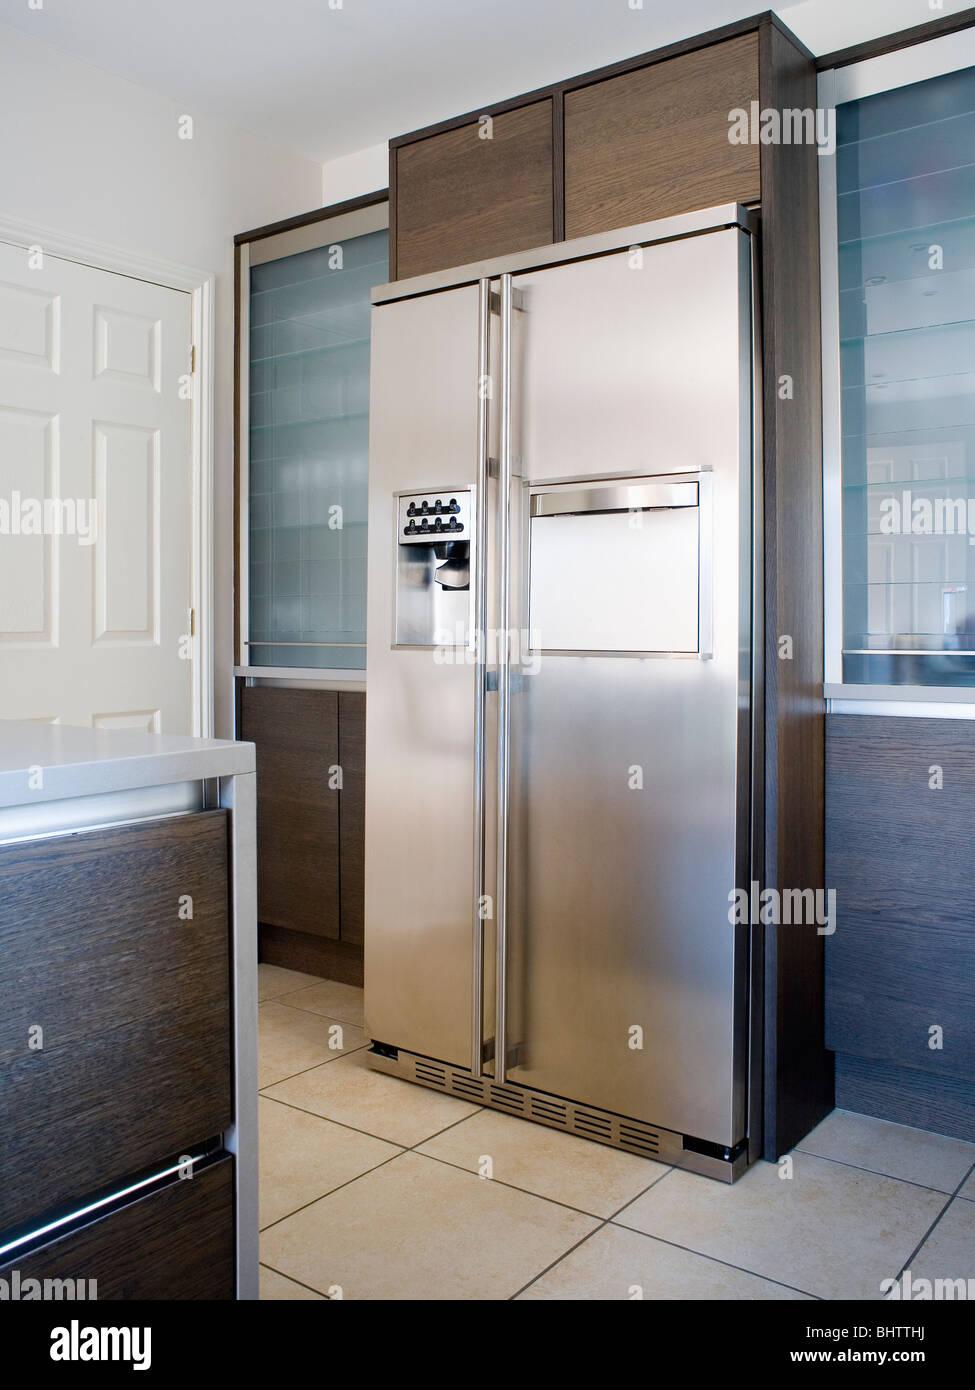 Large Americanstyle Stainlesssteel Fridgefreezer In. Bathroom Vanitys. Bed Bench. 72 Double Vanity. Multi Device Charging Station. Blue Bedrooms. Small Corner Bathtub. Deep Seat Sofa. Brown Subway Tile